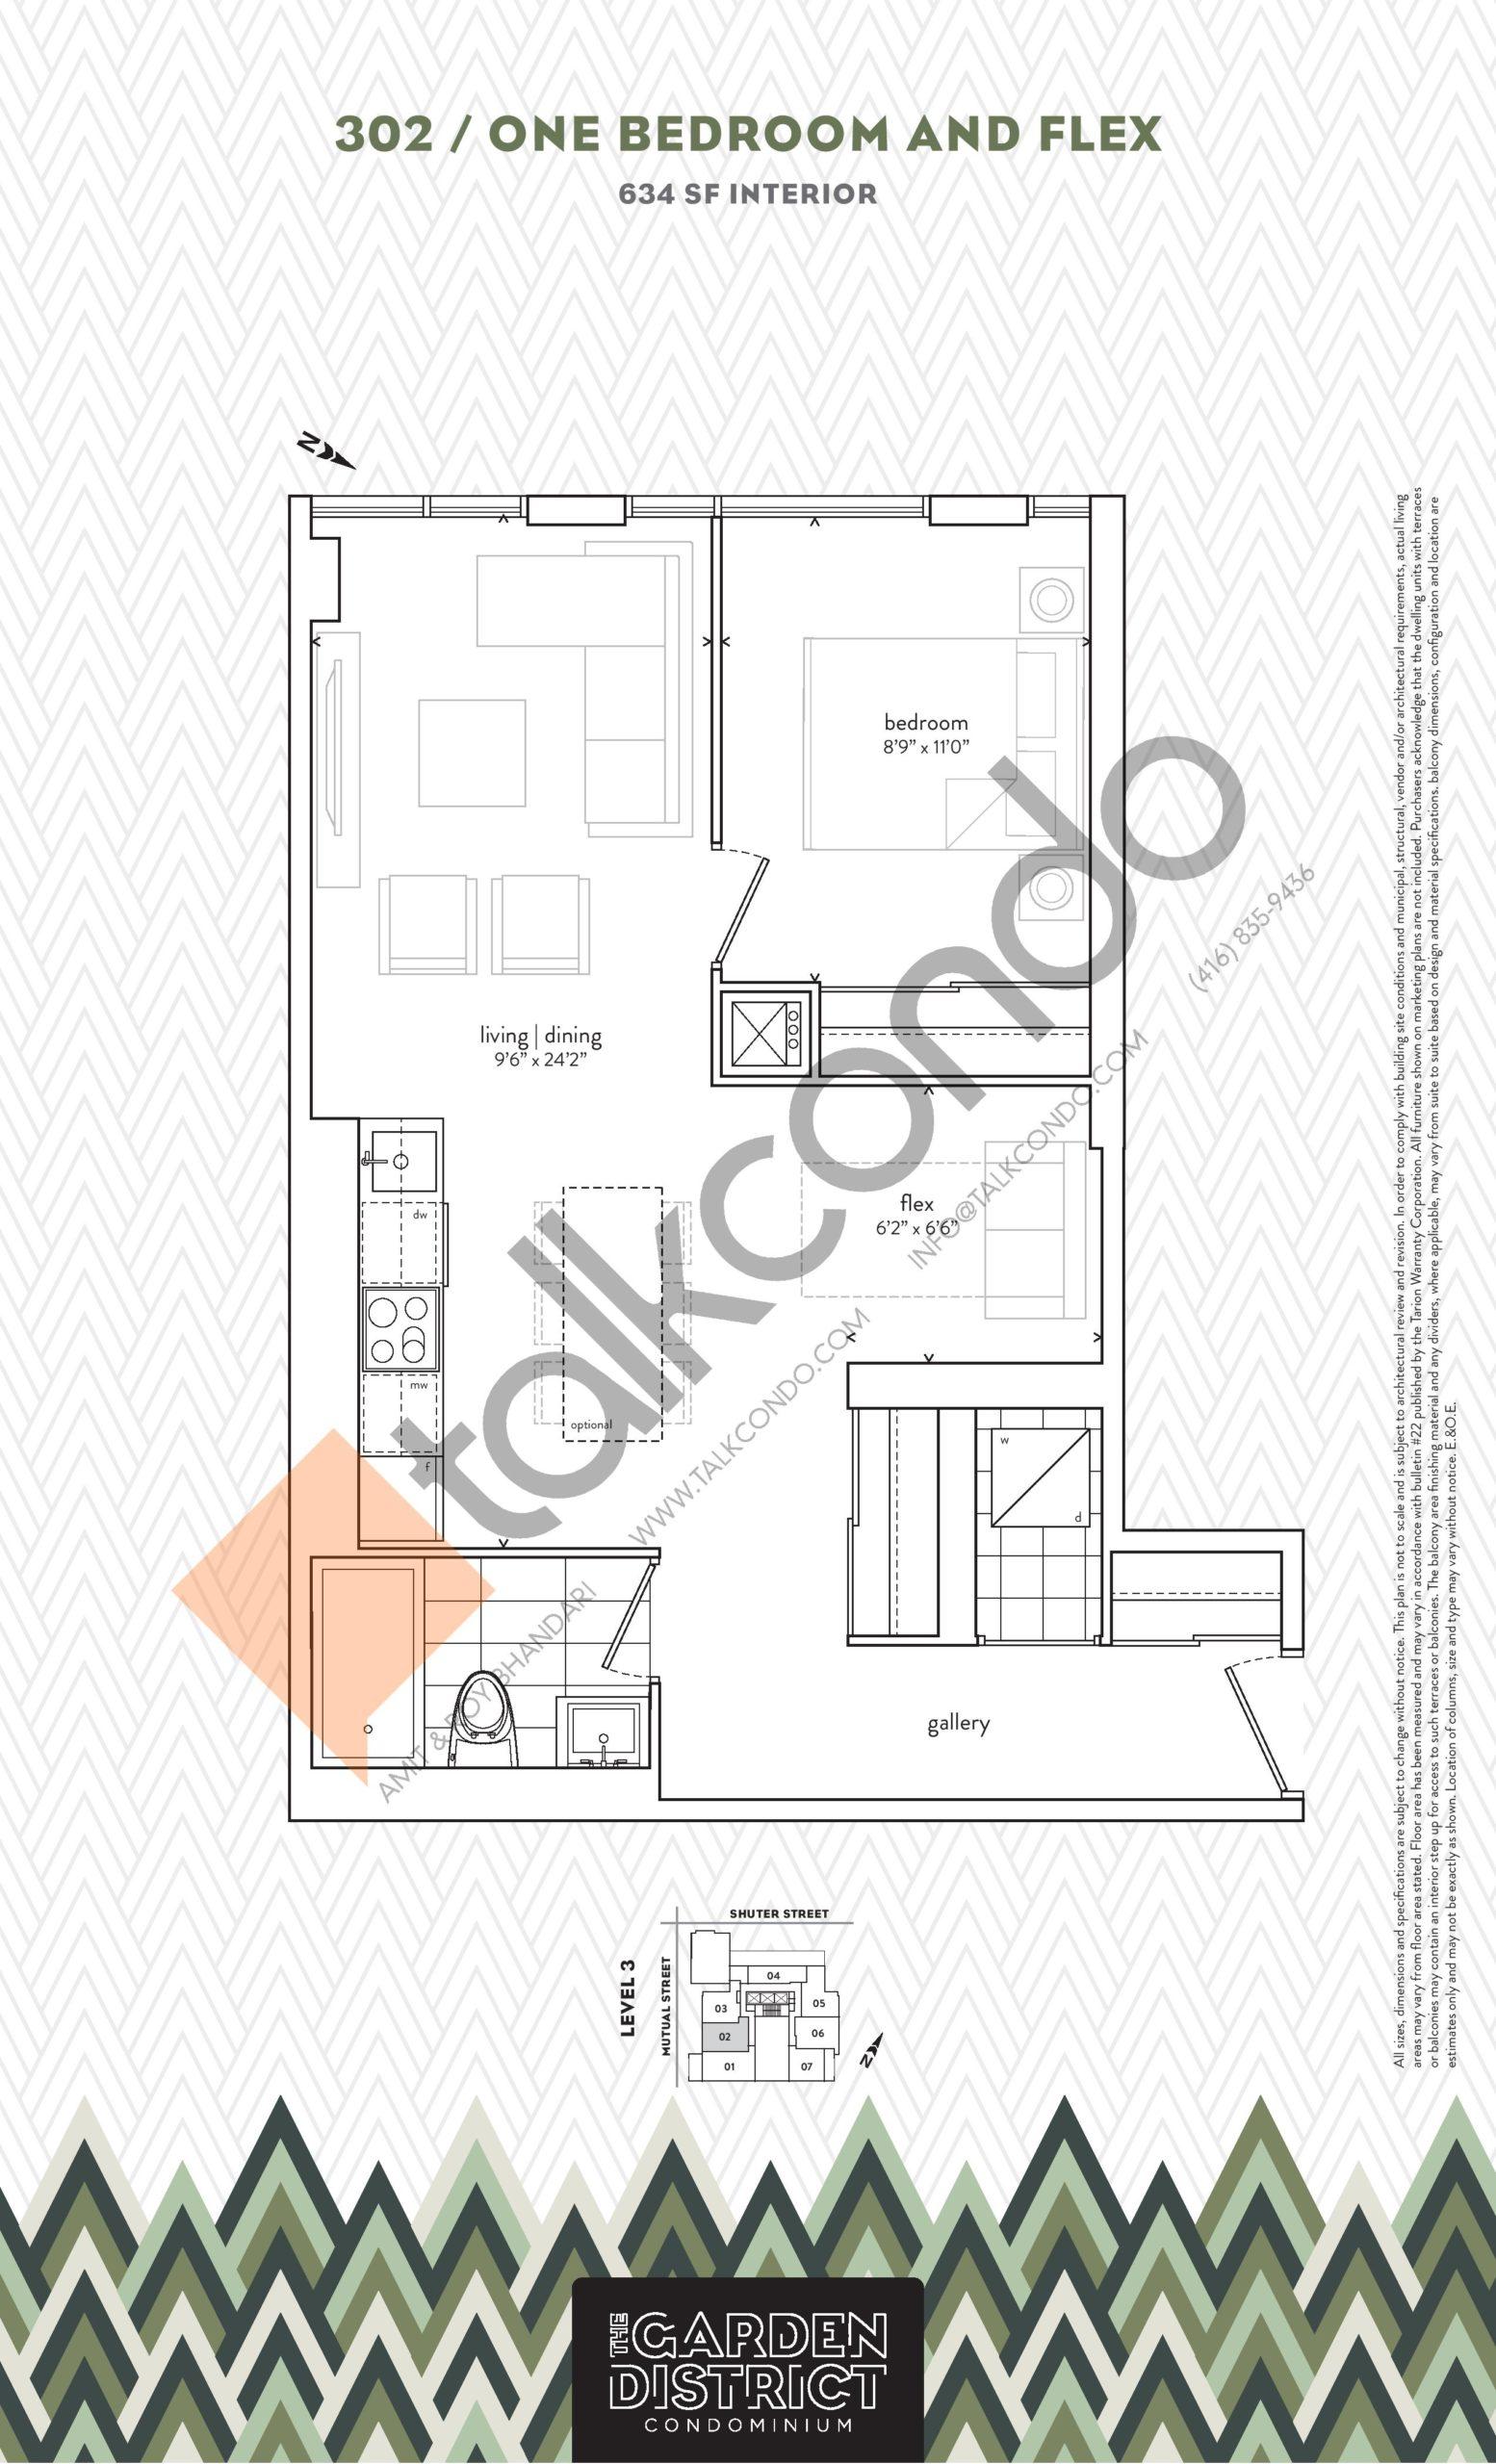 302 Floor Plan at Garden District Condos - 634 sq.ft